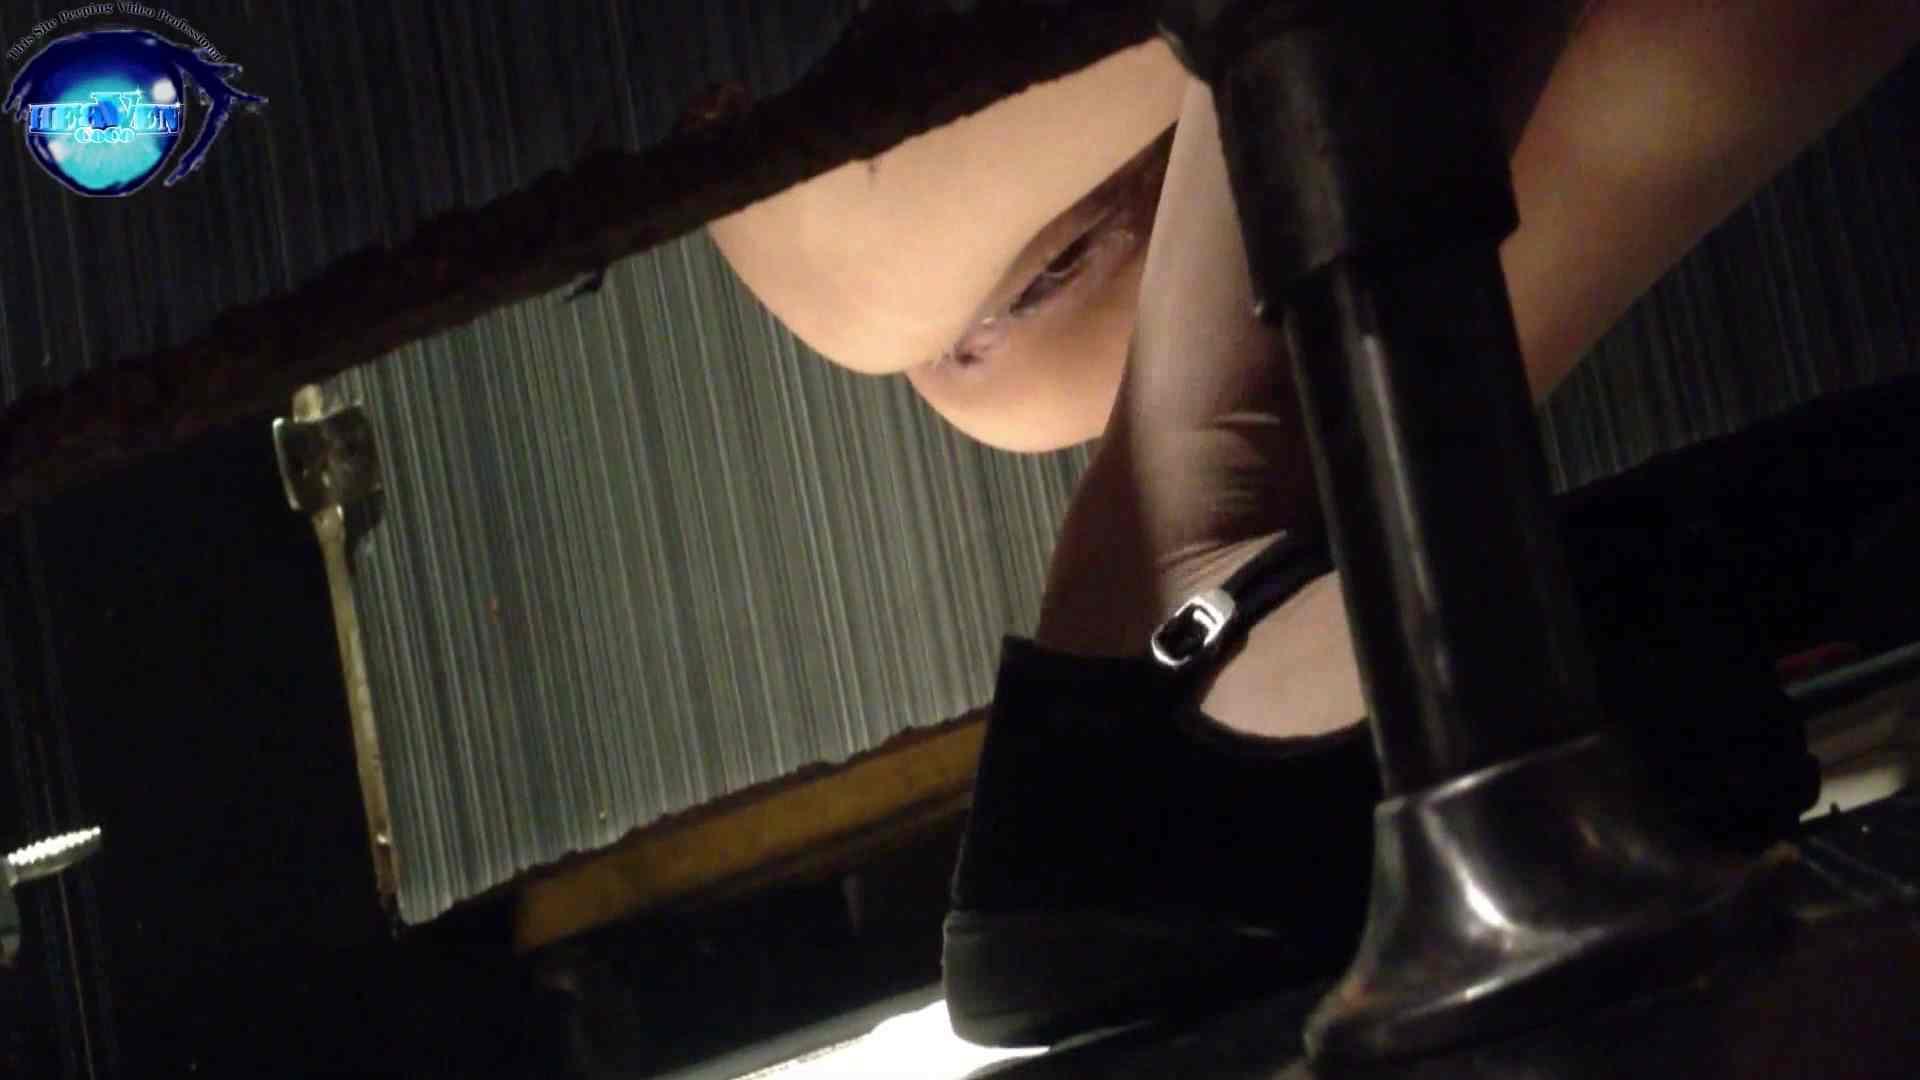 GOD HAND ファッションショッピングセンター盗撮vol.02前編 盗撮 ワレメ無修正動画無料 74連発 71